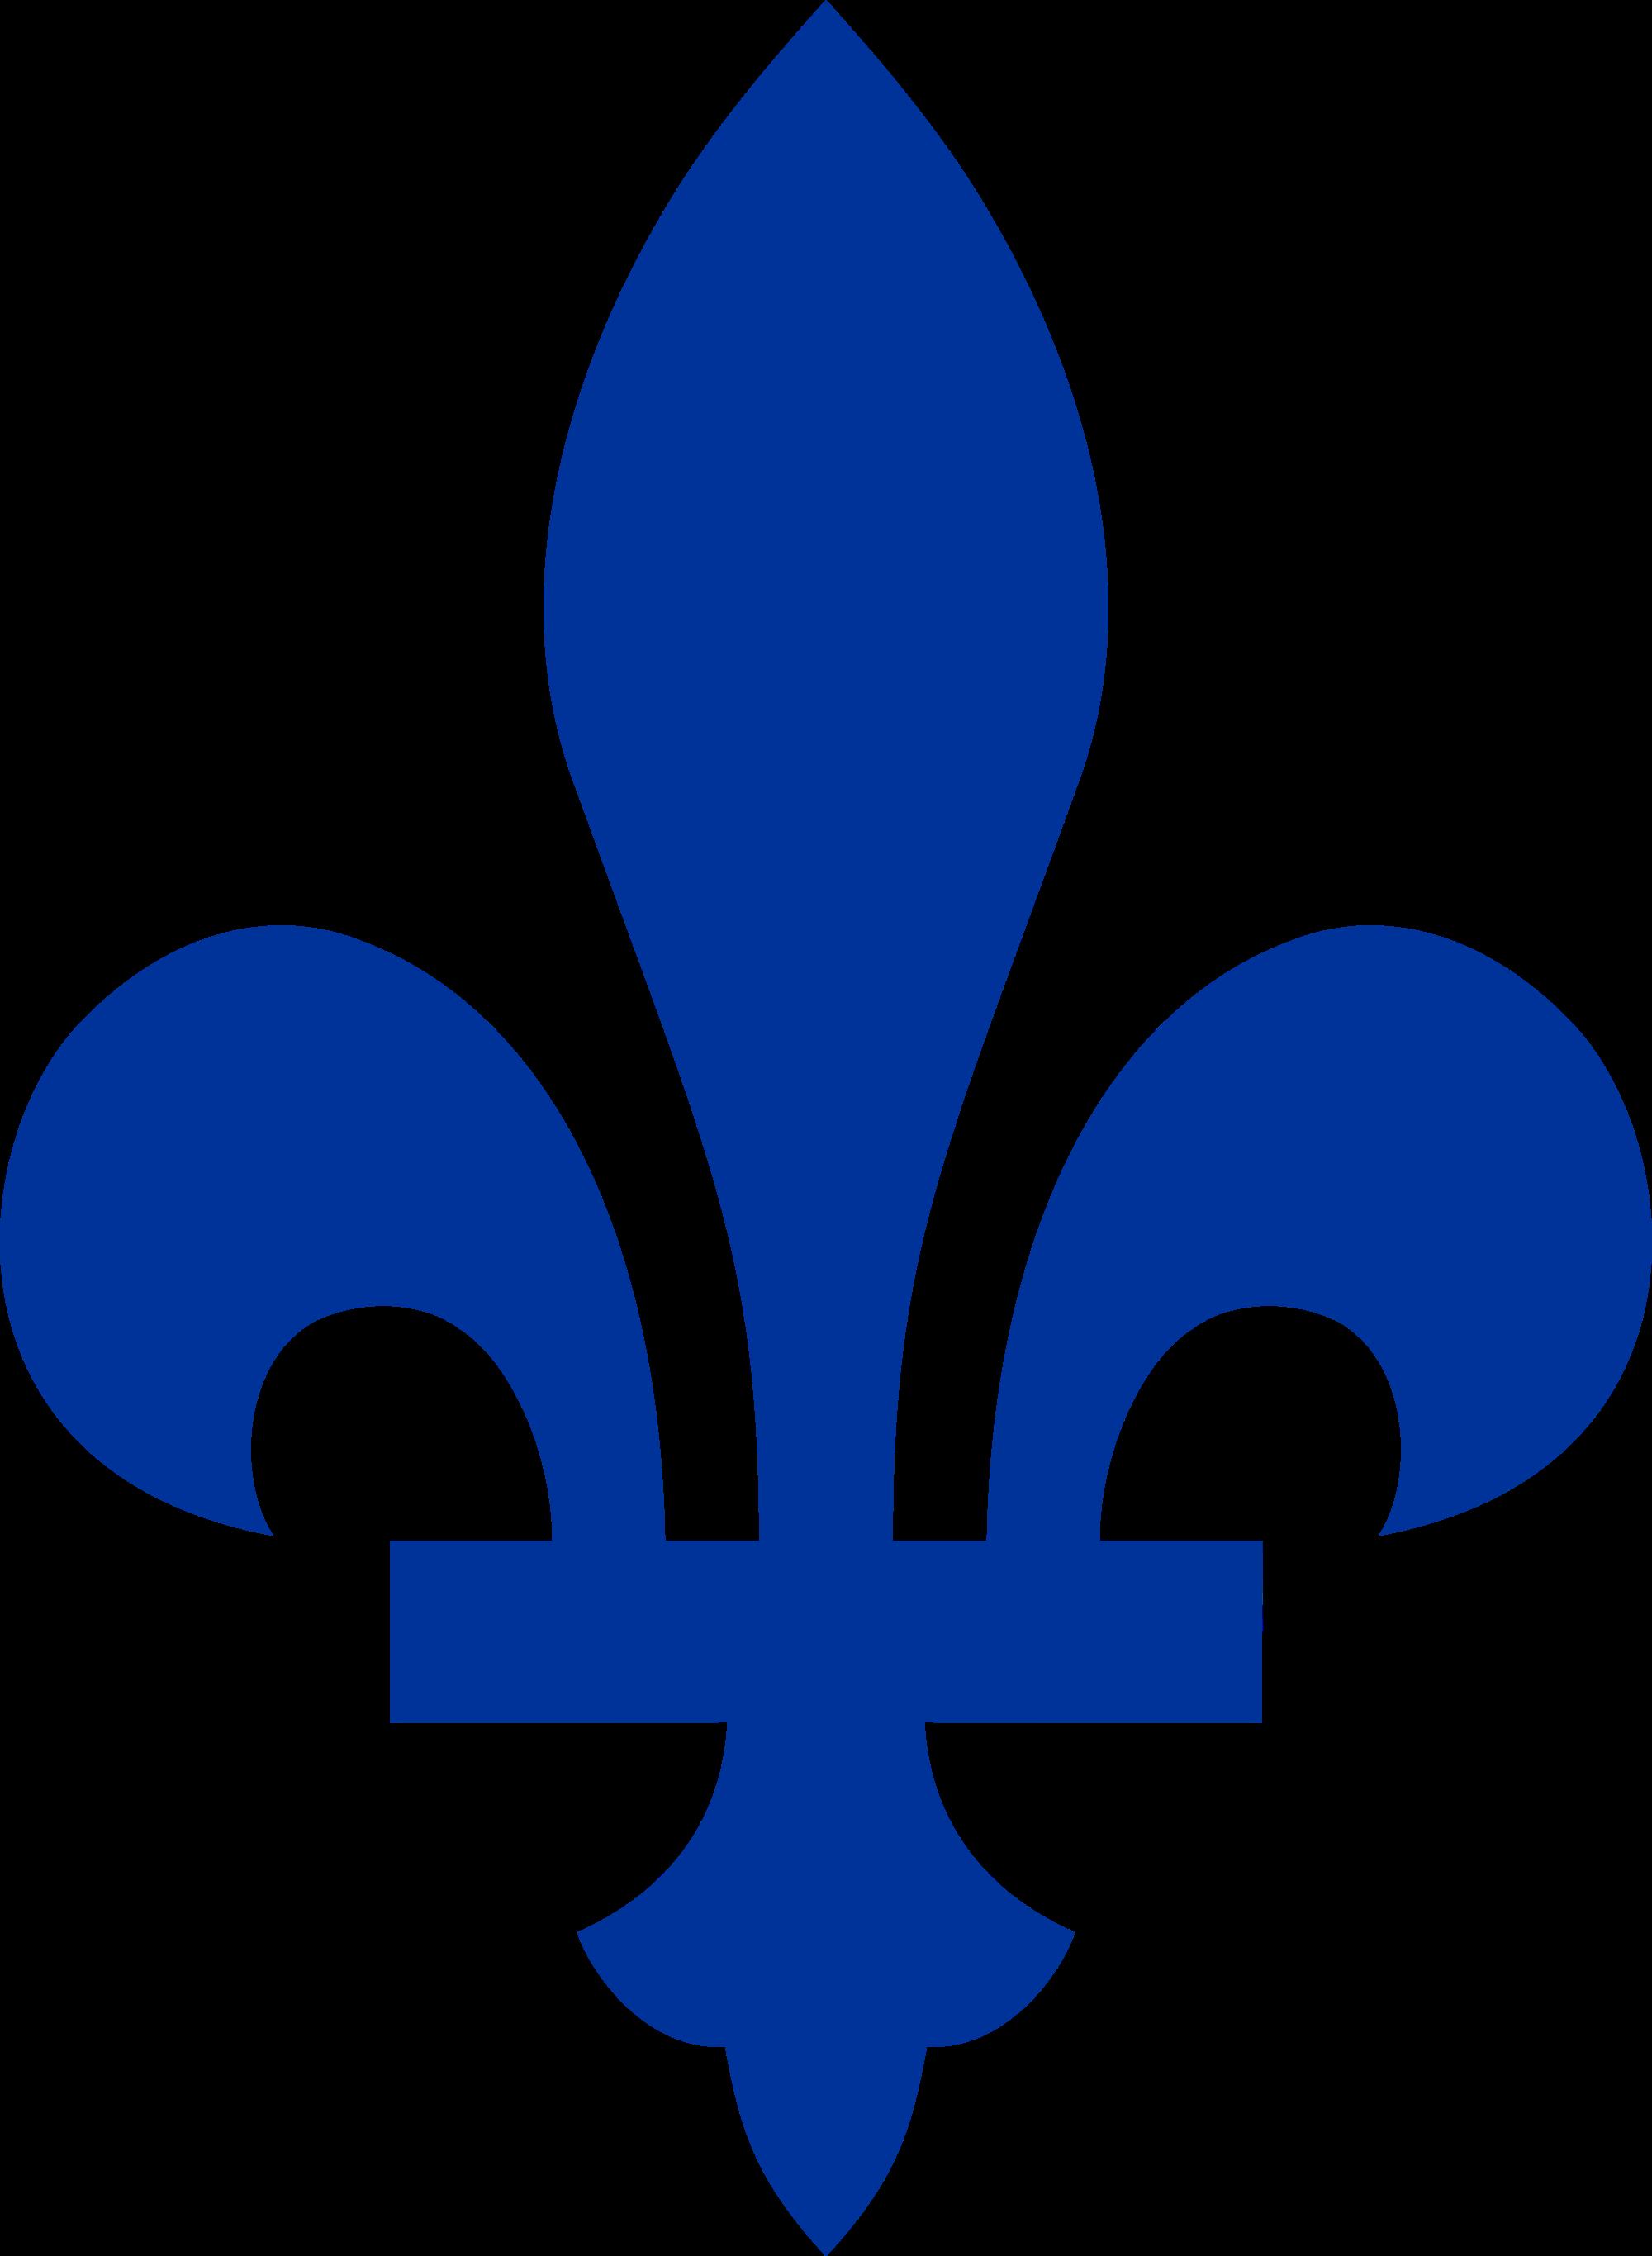 Fleur de lis wikipedia. Dictionary clipart french dictionary